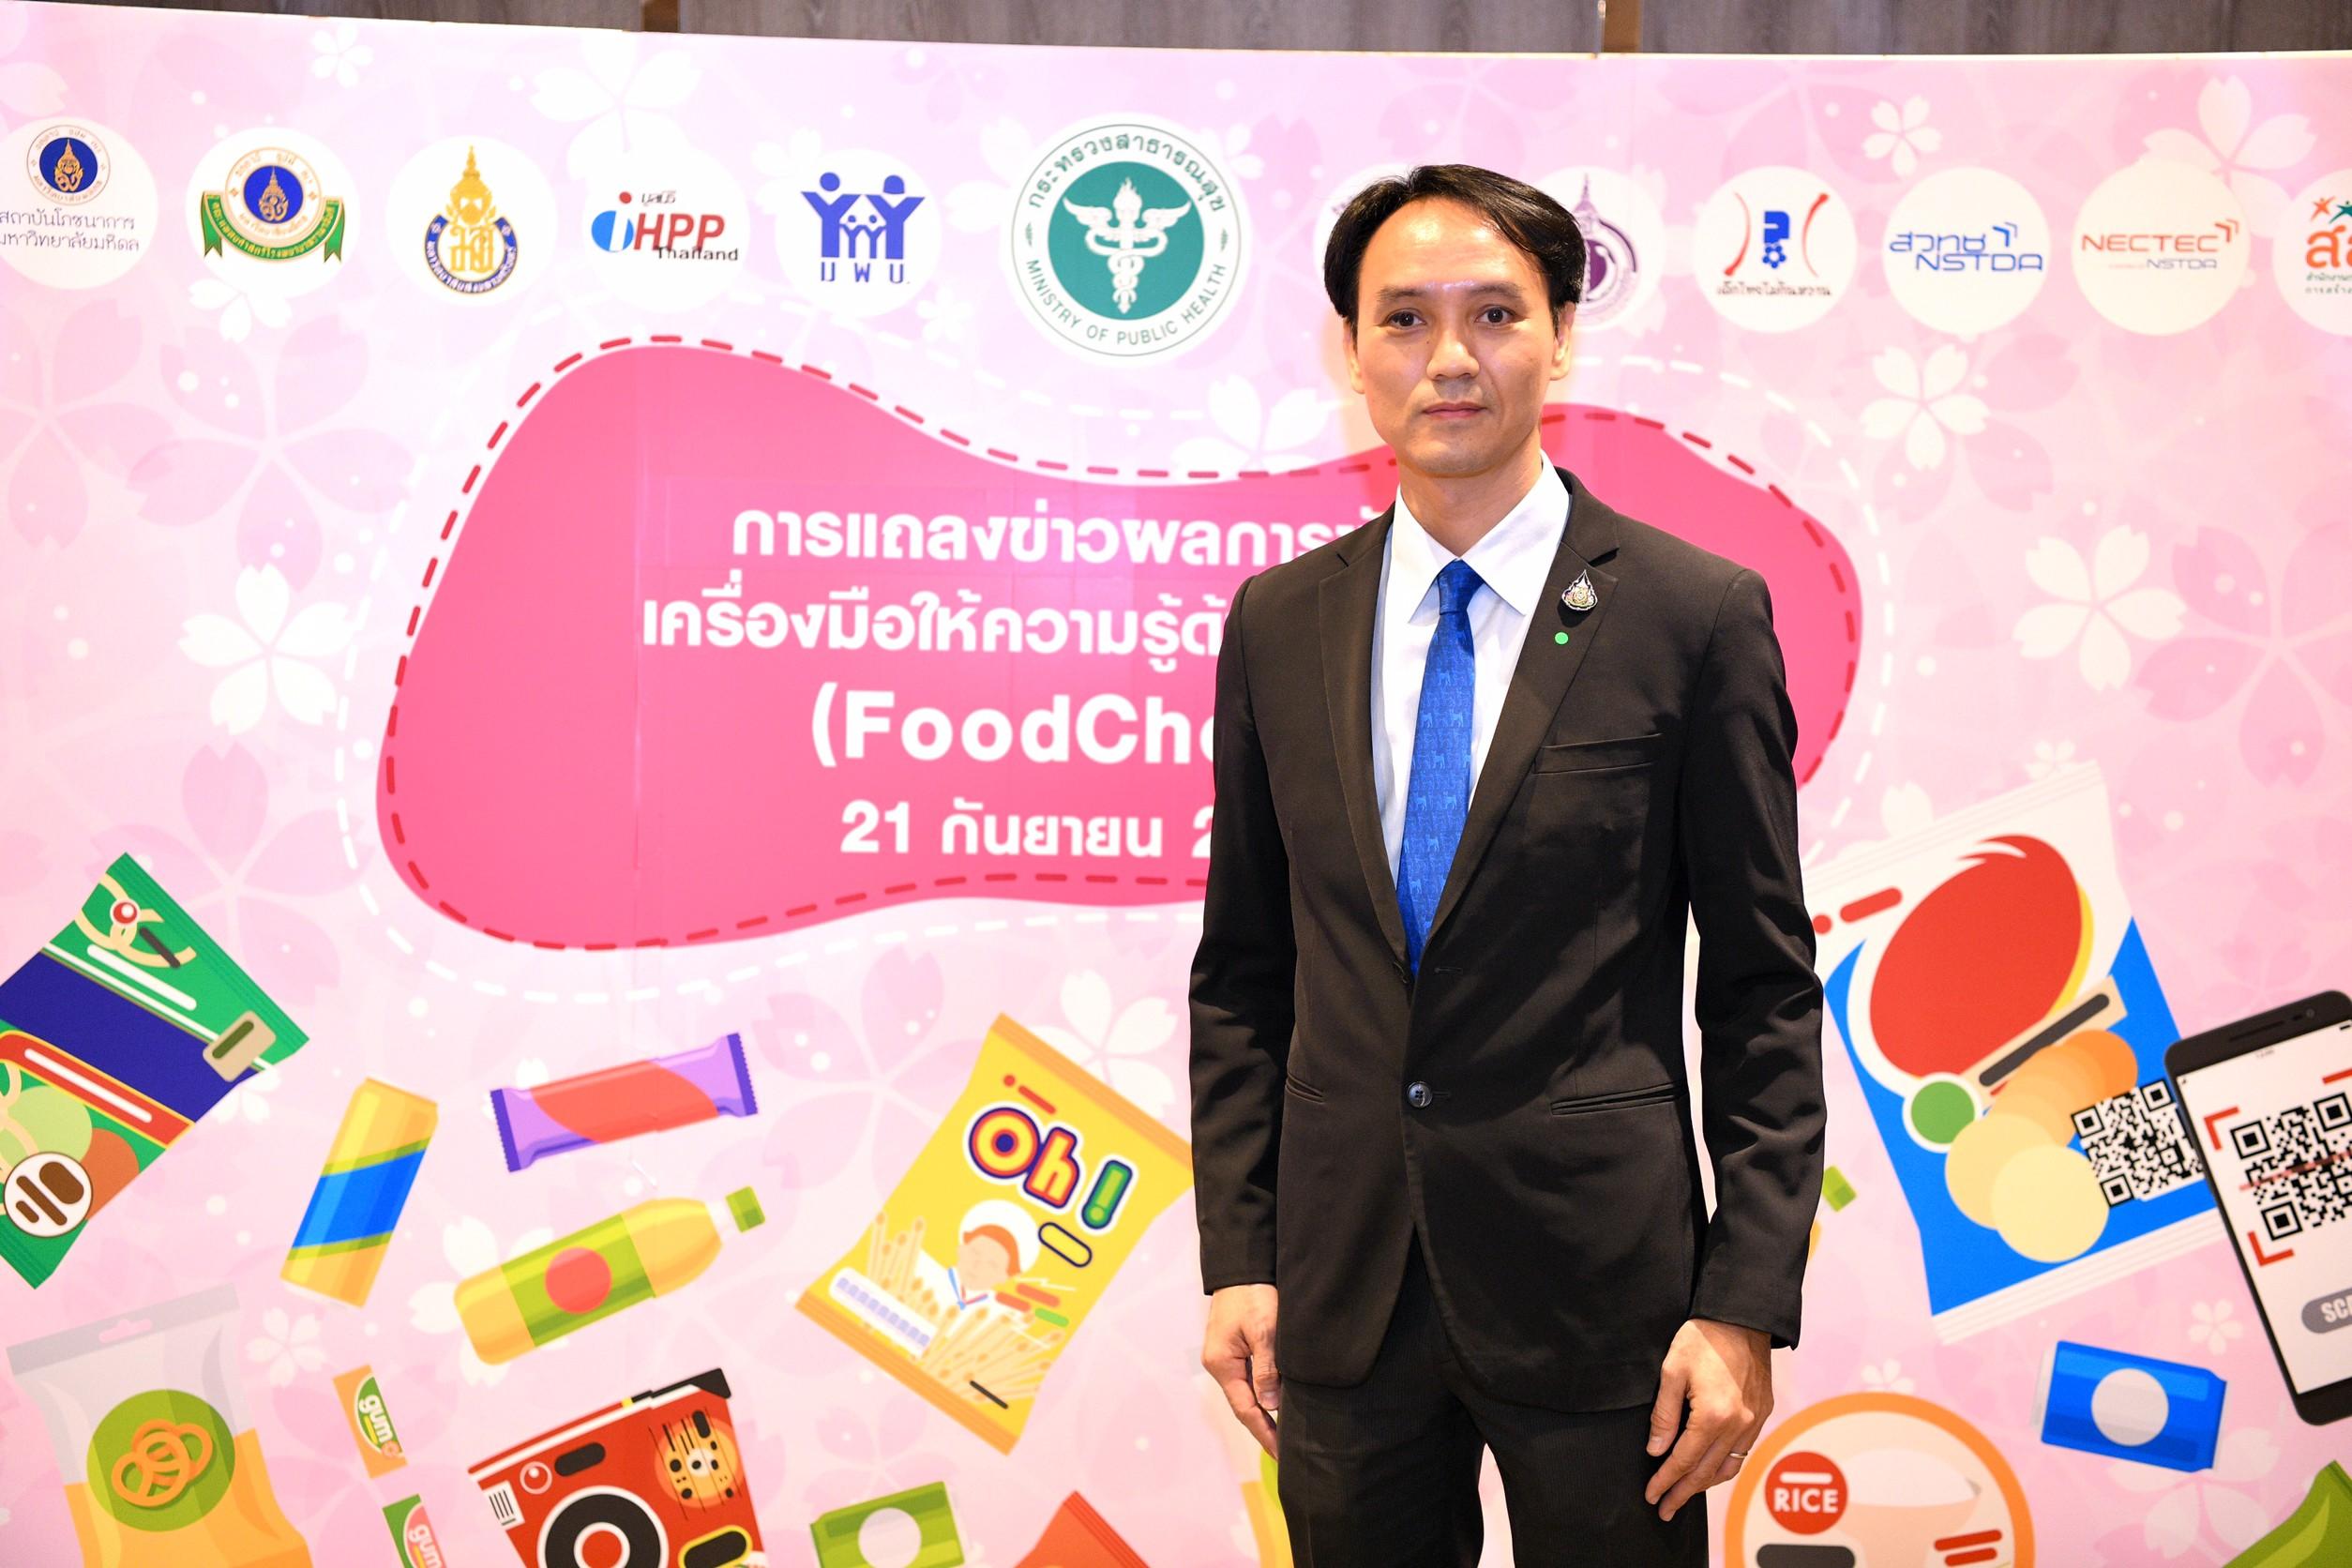 FoodChoice สแกนก่อนกิน  นวัตกรรมใหม่เพื่อสุขภาพ  thaihealth